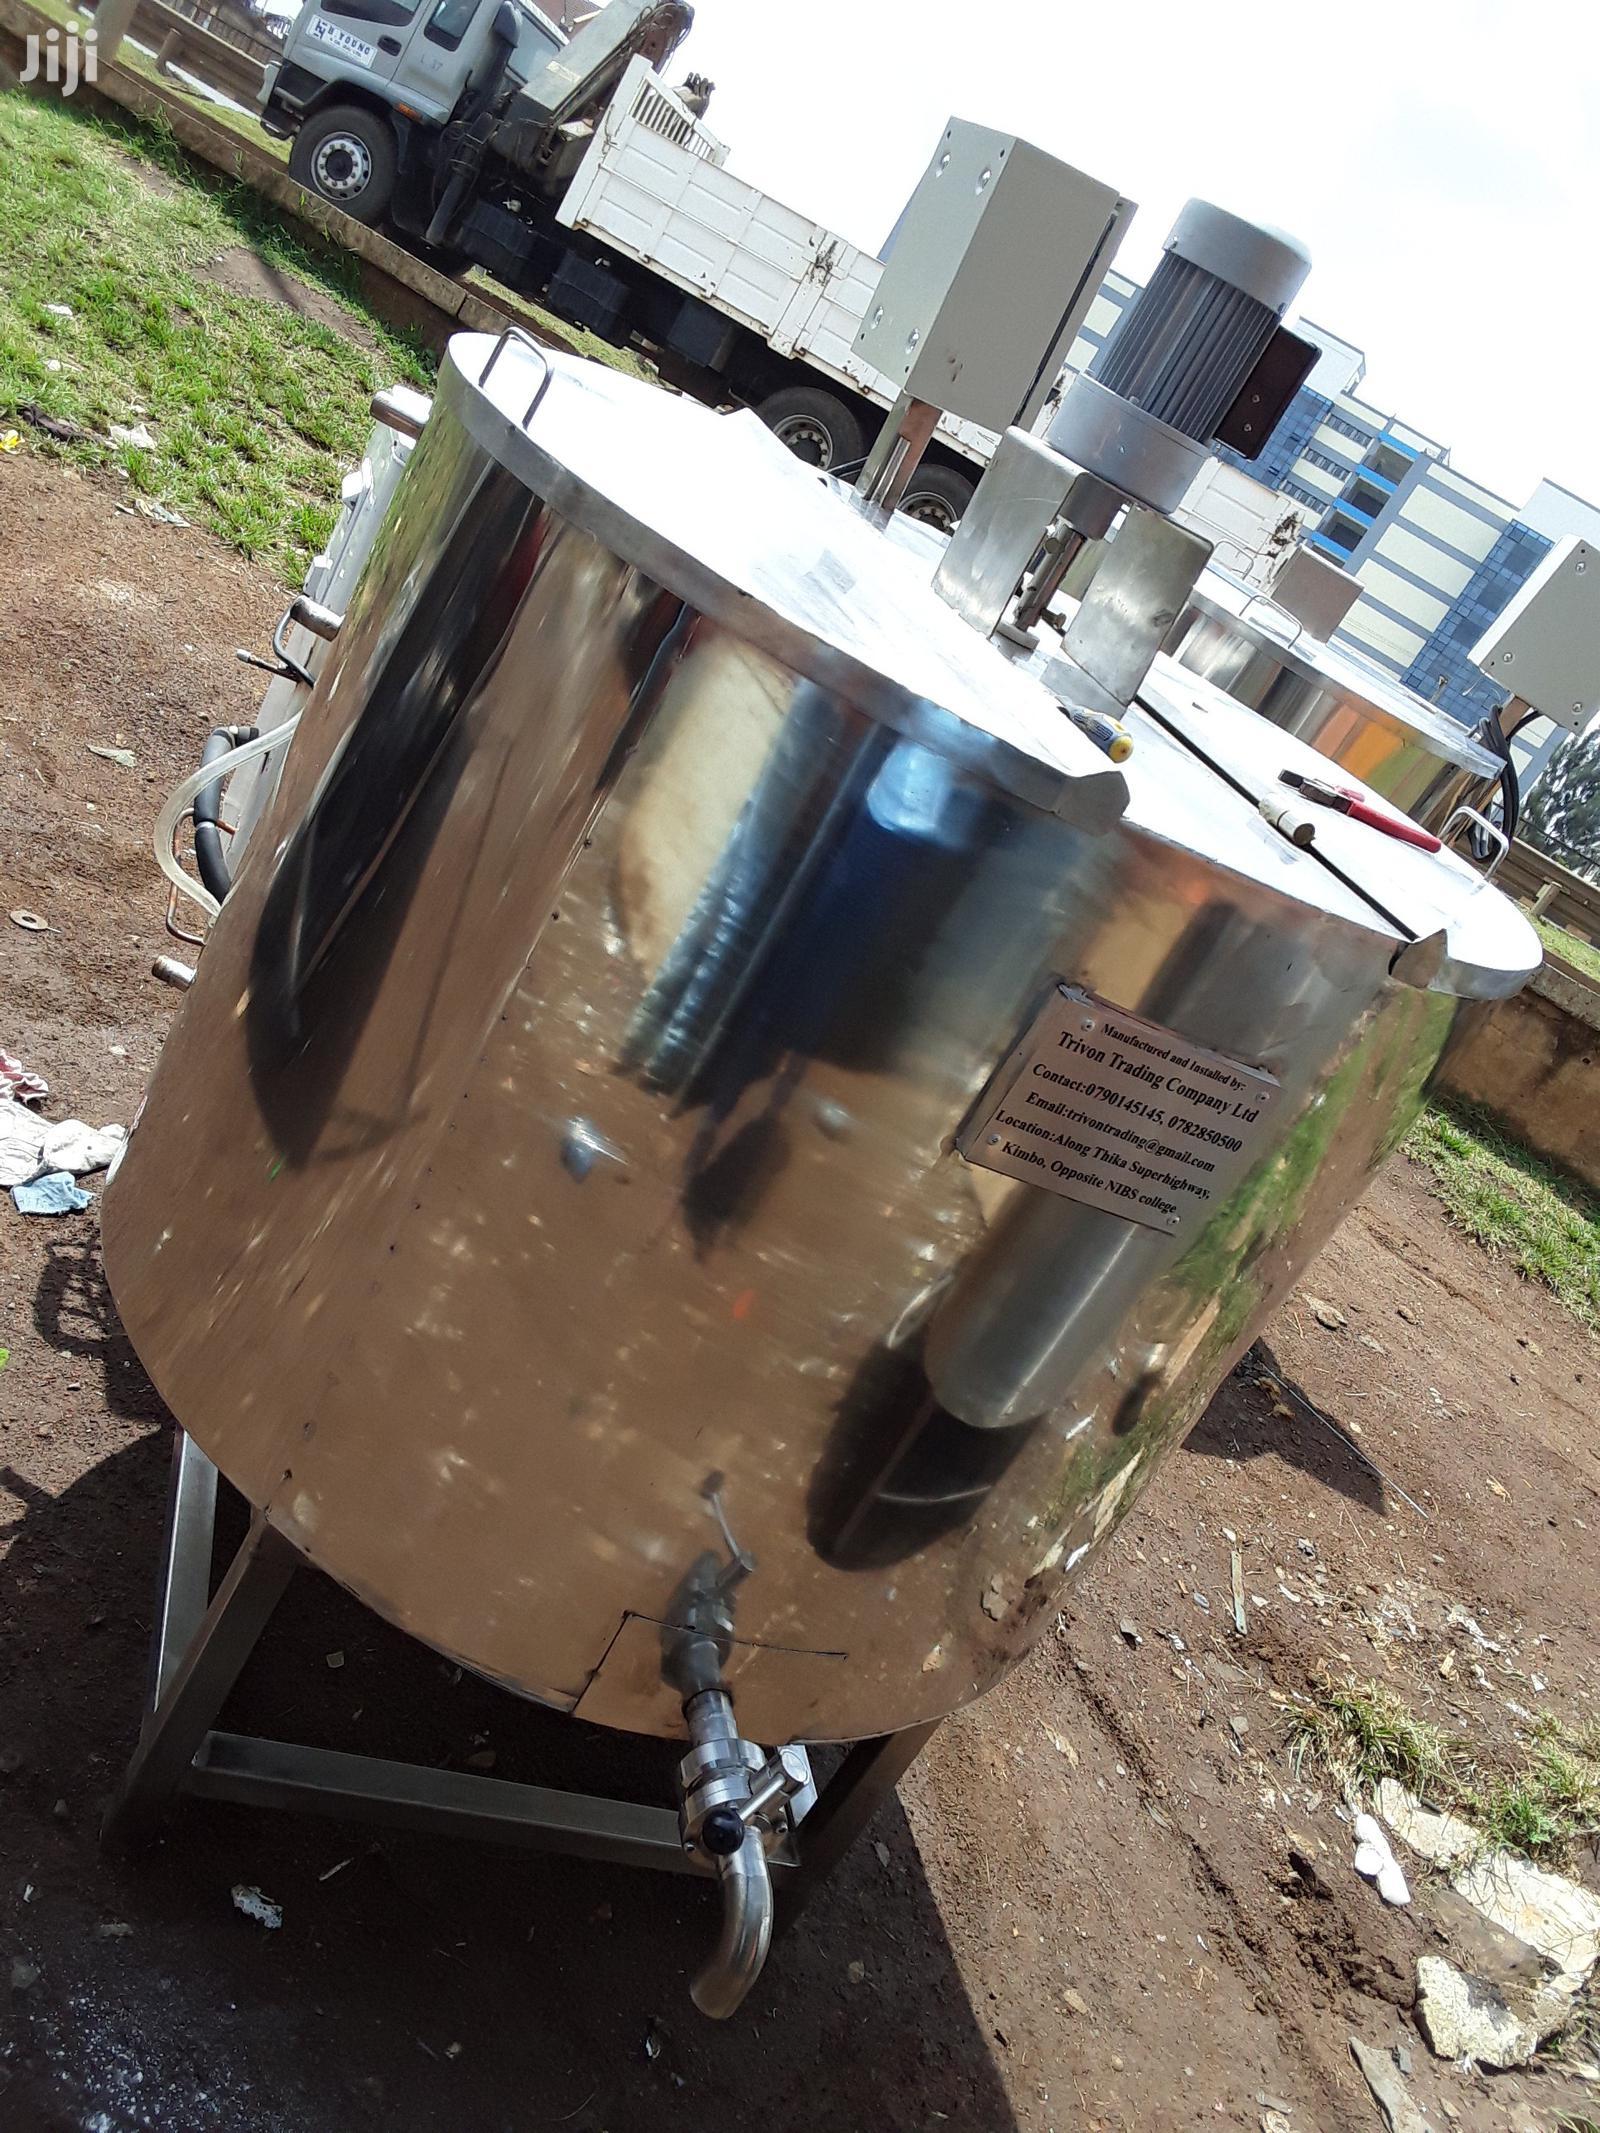 Batch Milk Pasteurizer/Boiler | Farm Machinery & Equipment for sale in Ruiru, Kiambu, Kenya